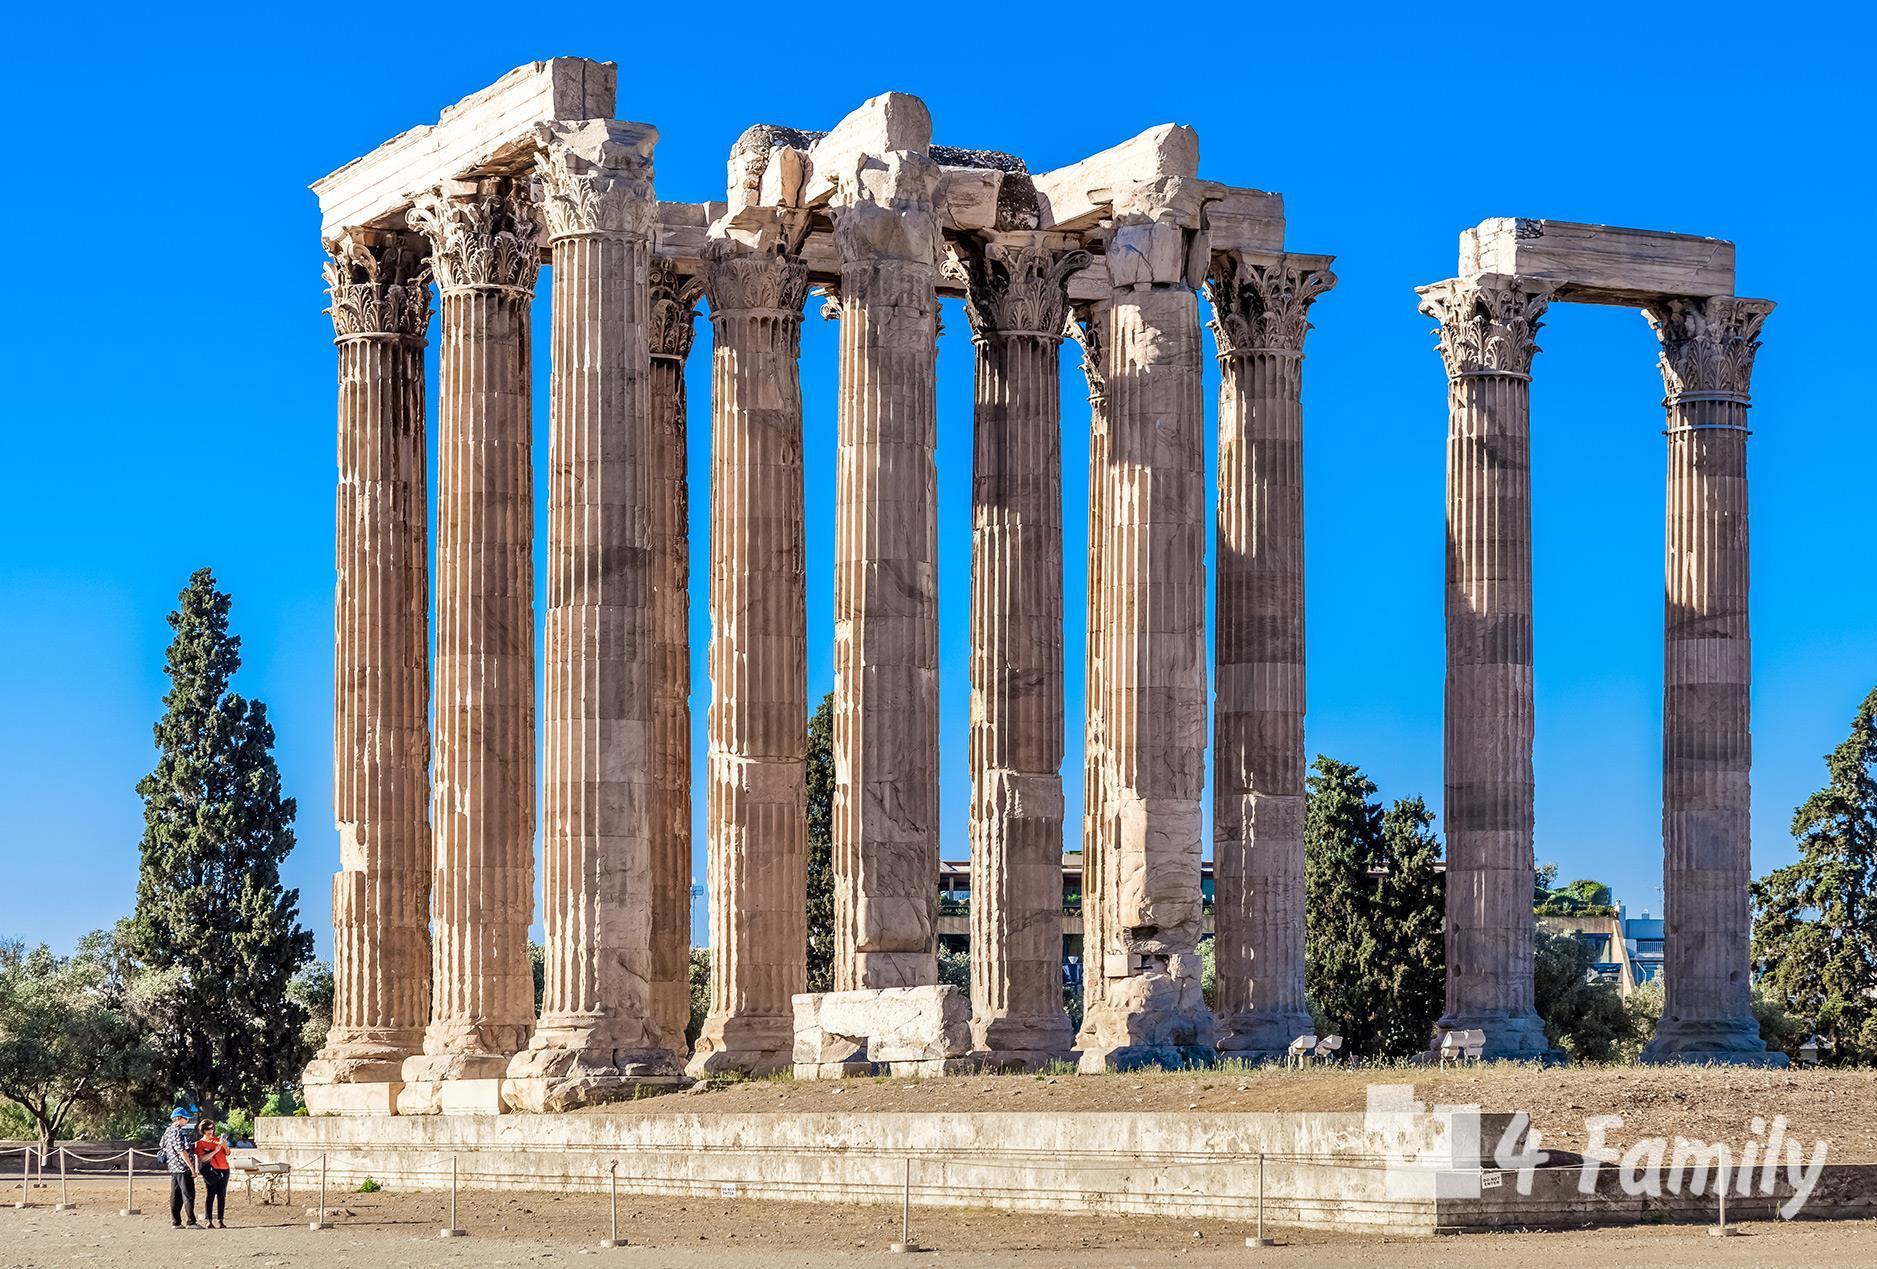 4family Чем известен Храм Зевса Олимпийского